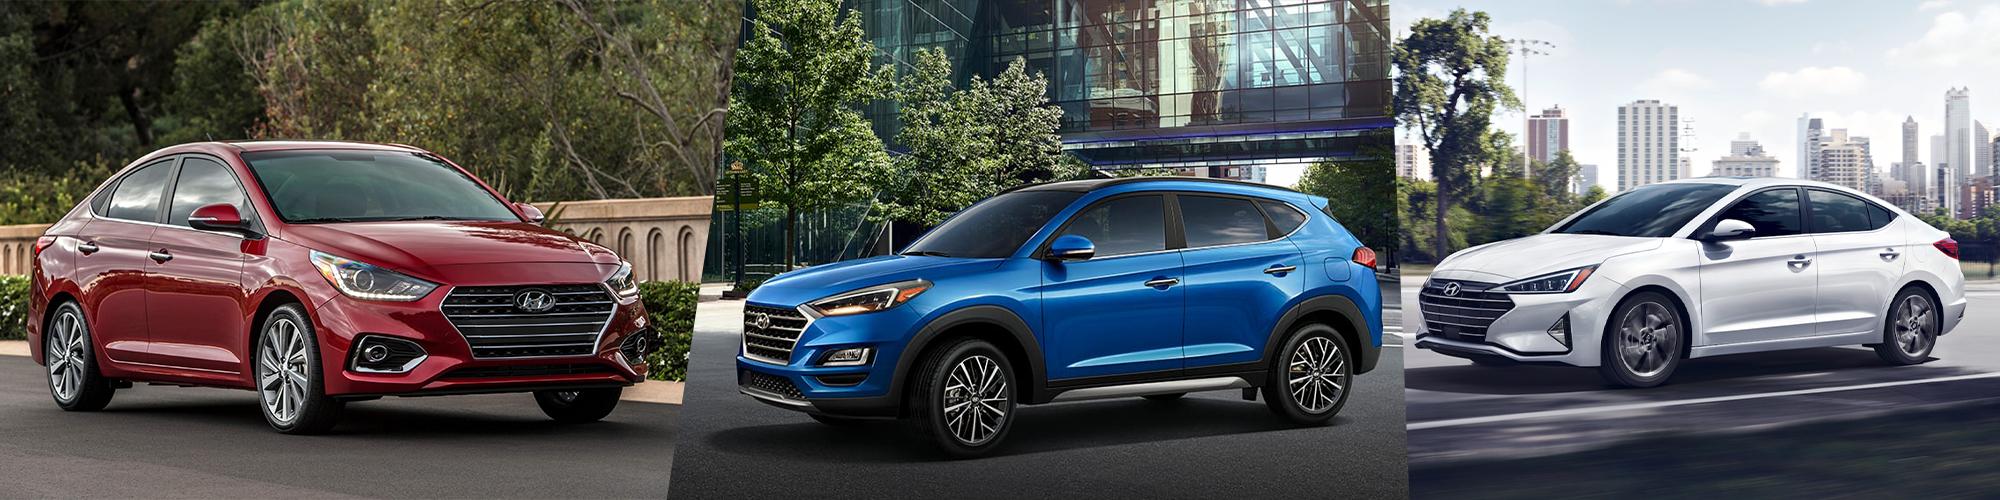 2019 Hyundai Models